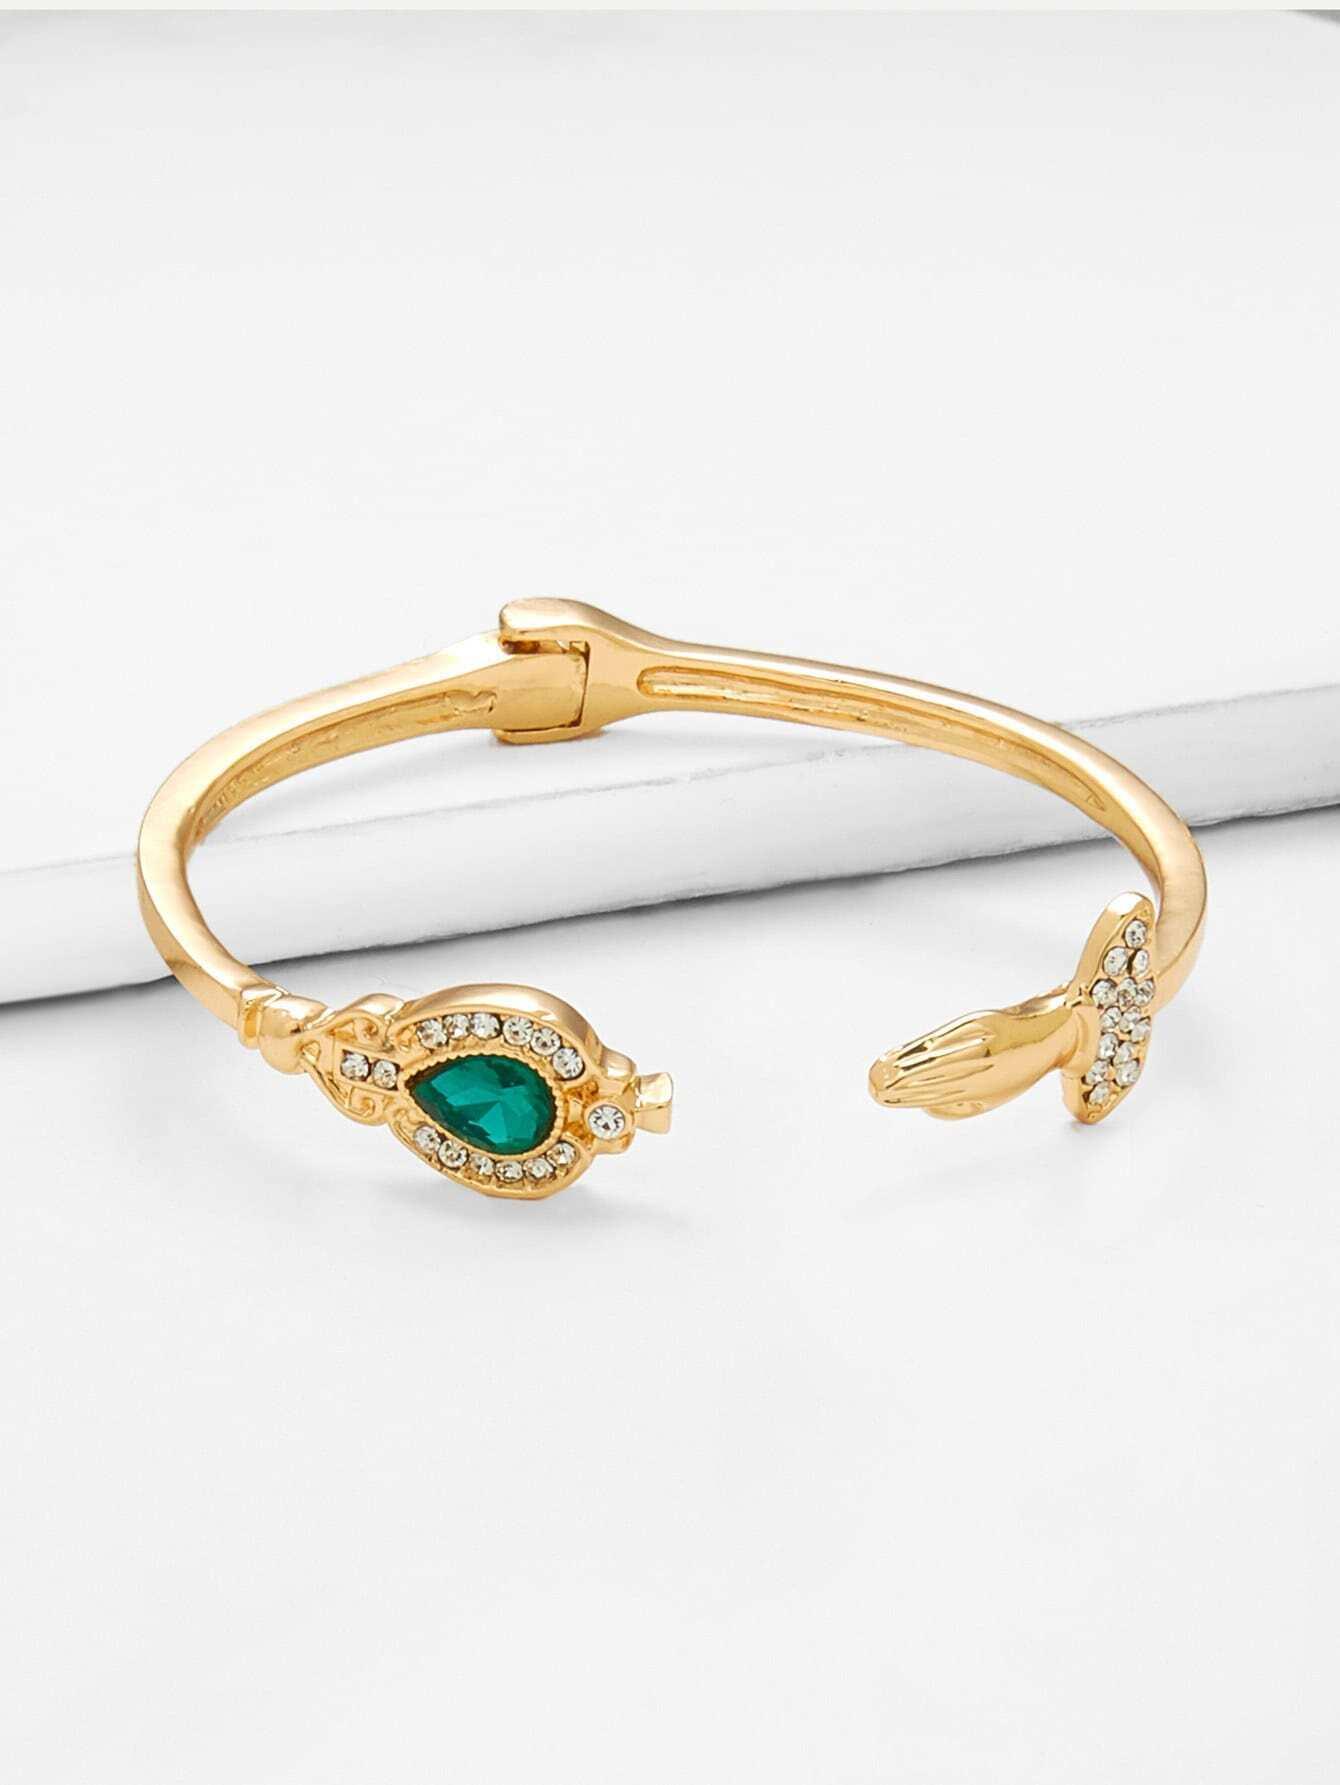 Rhinestone Detail Cuff Bracelet faux pearl detail layered cuff bracelet